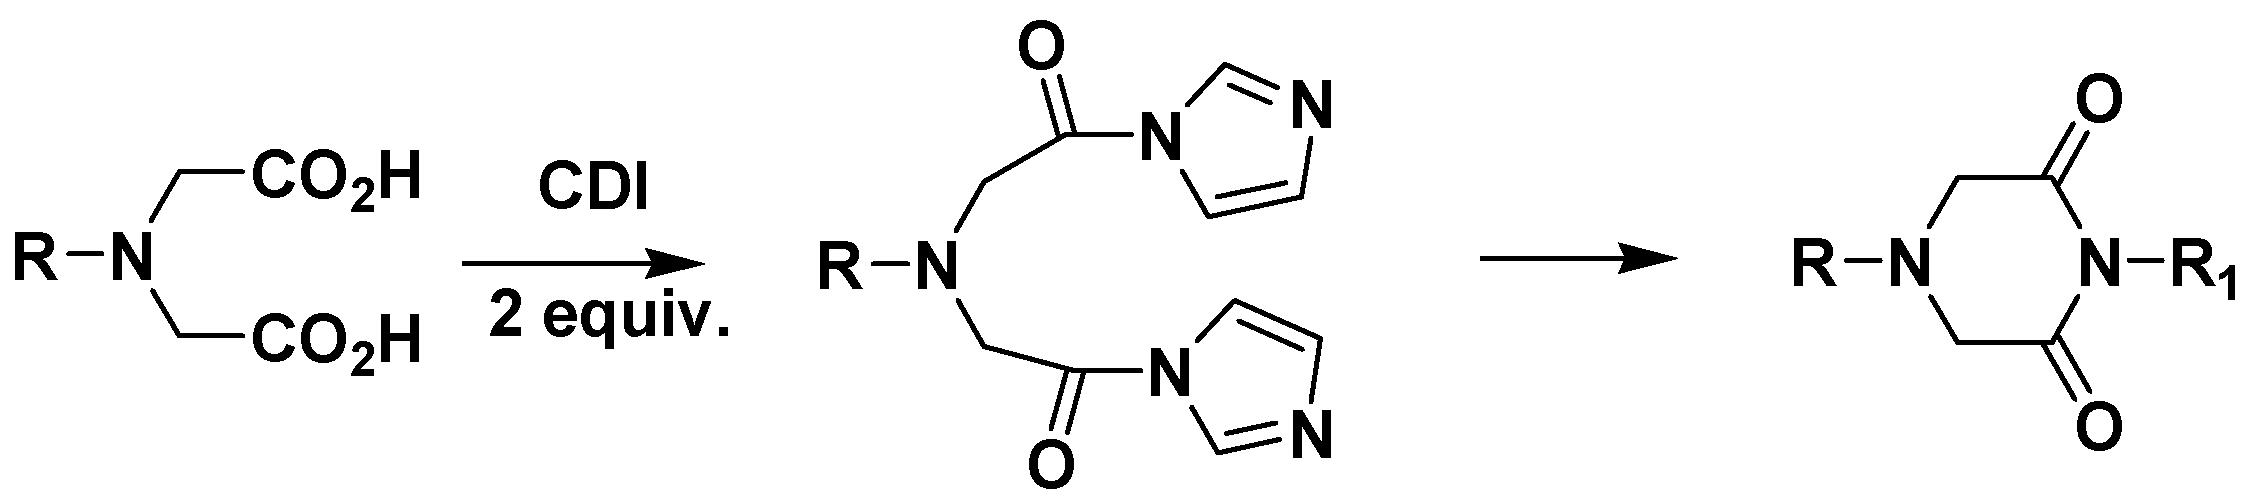 preparation of 1 phenyl 3 phenylaminopyrrolidine 2 5 dione an organic laboratory Zju-ens joint laboratory of preparation of 3,4-dichloro-1-phenyl-1h-pyrrole-2,5-dione preparation of 2-phenyl-pyrrolo[3,4-b][1,4.